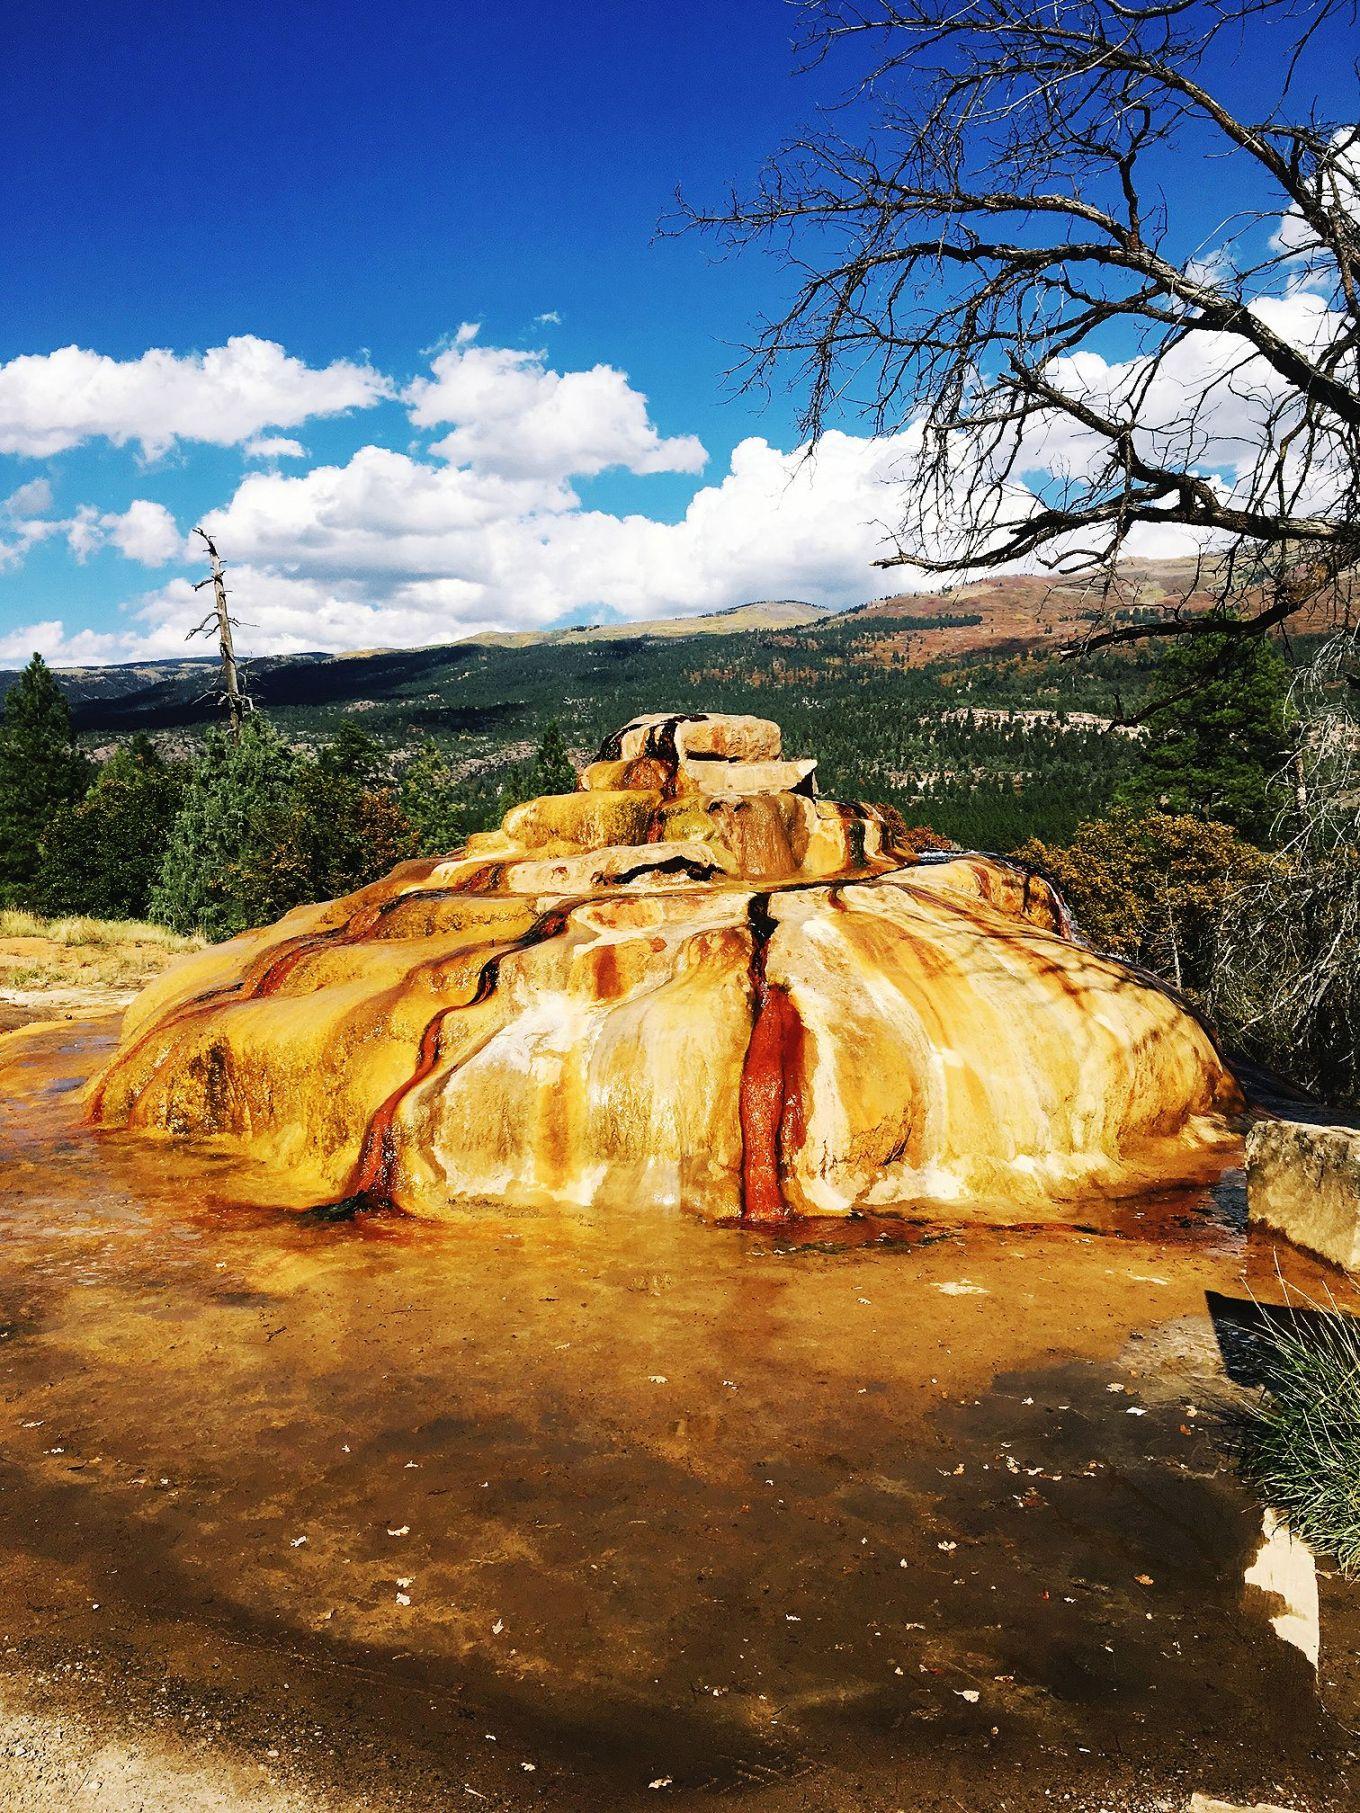 Pinkerton Hot Springs, Colorado Springs, CO